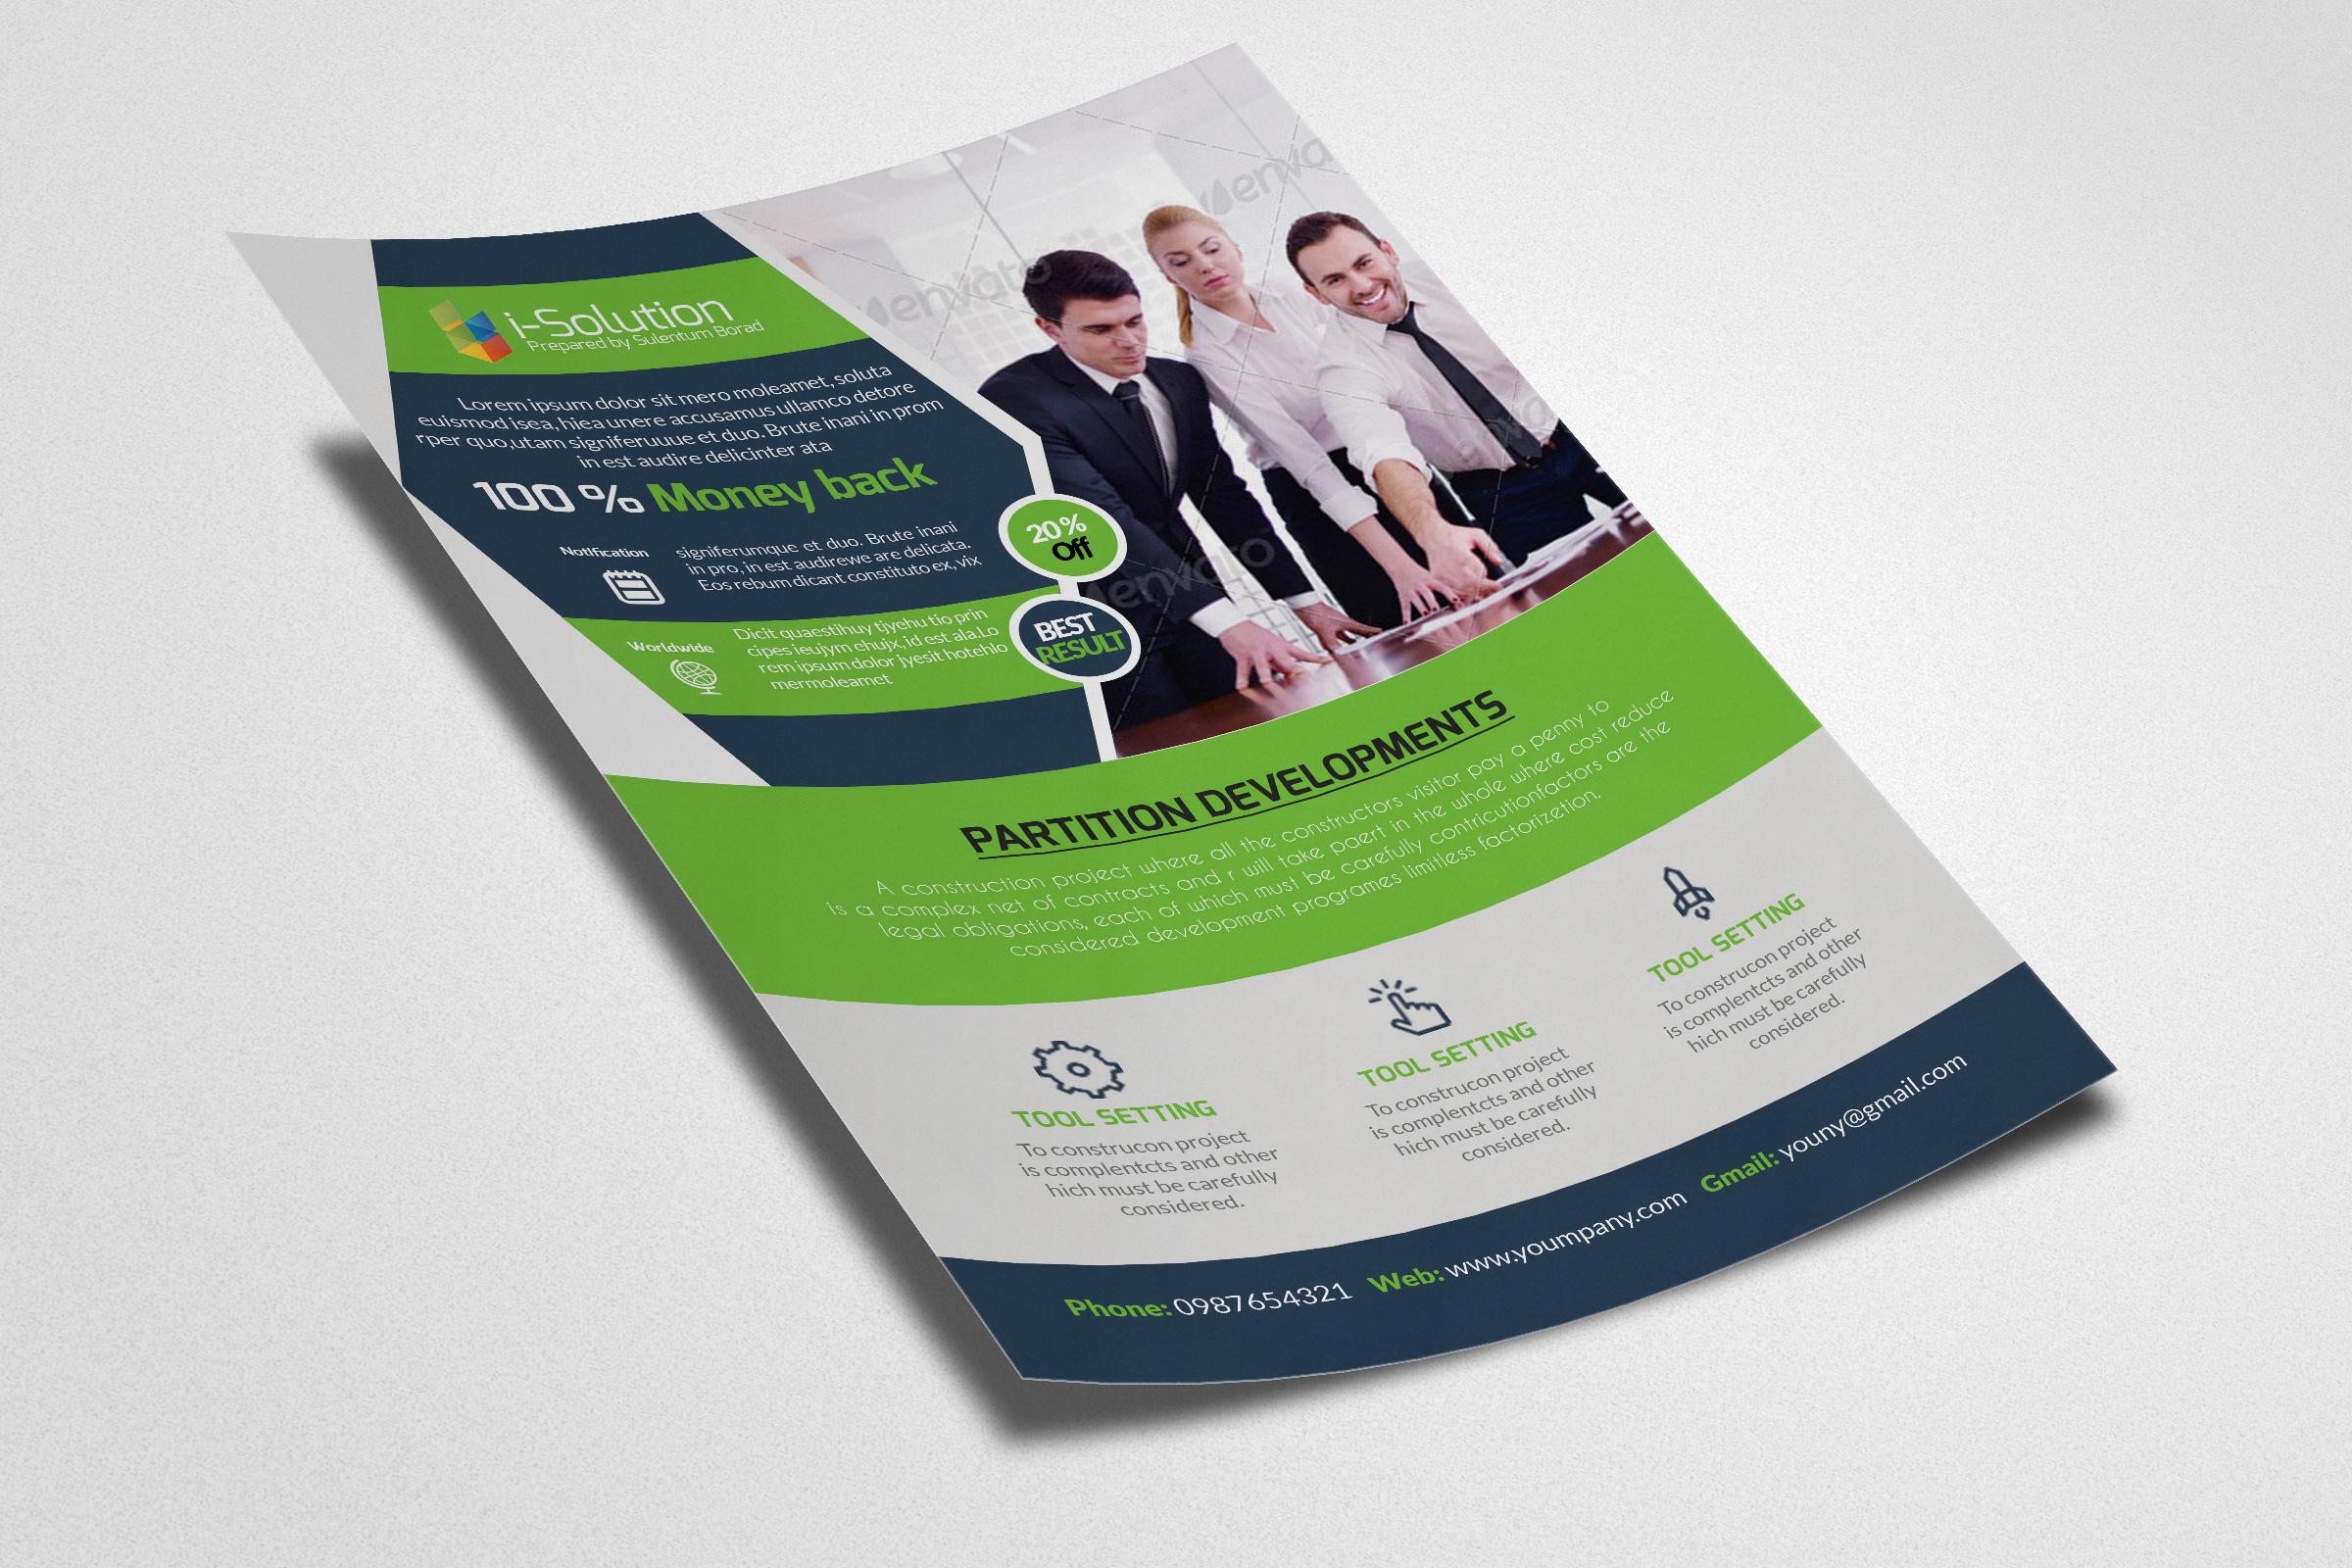 Business Marketing Management Flyers example image 3